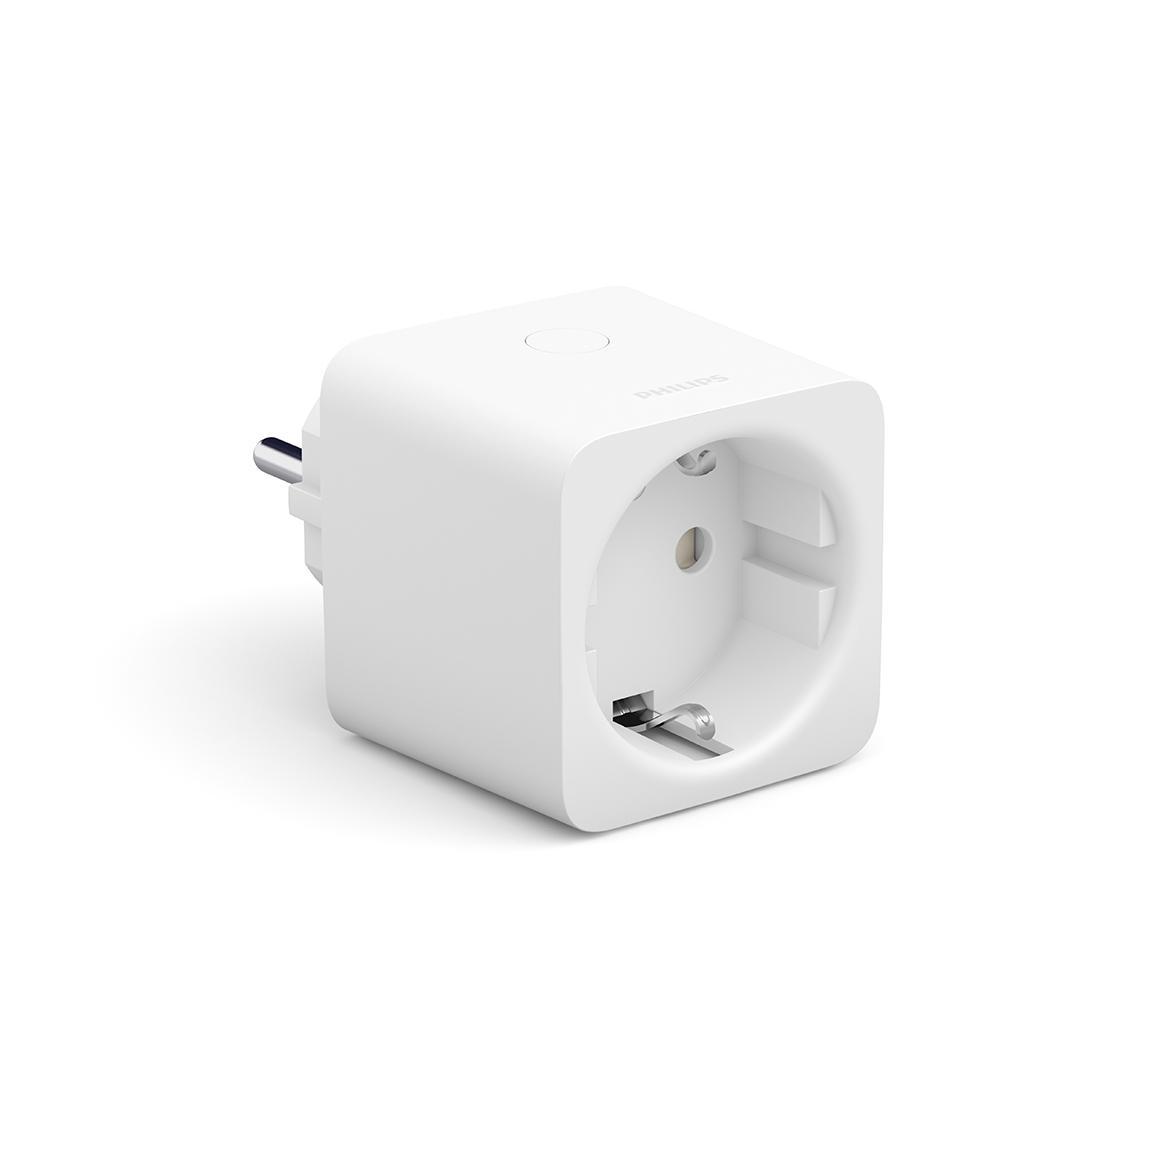 Philips Hue Smart Plug - Smarte Steckdose - Weiß